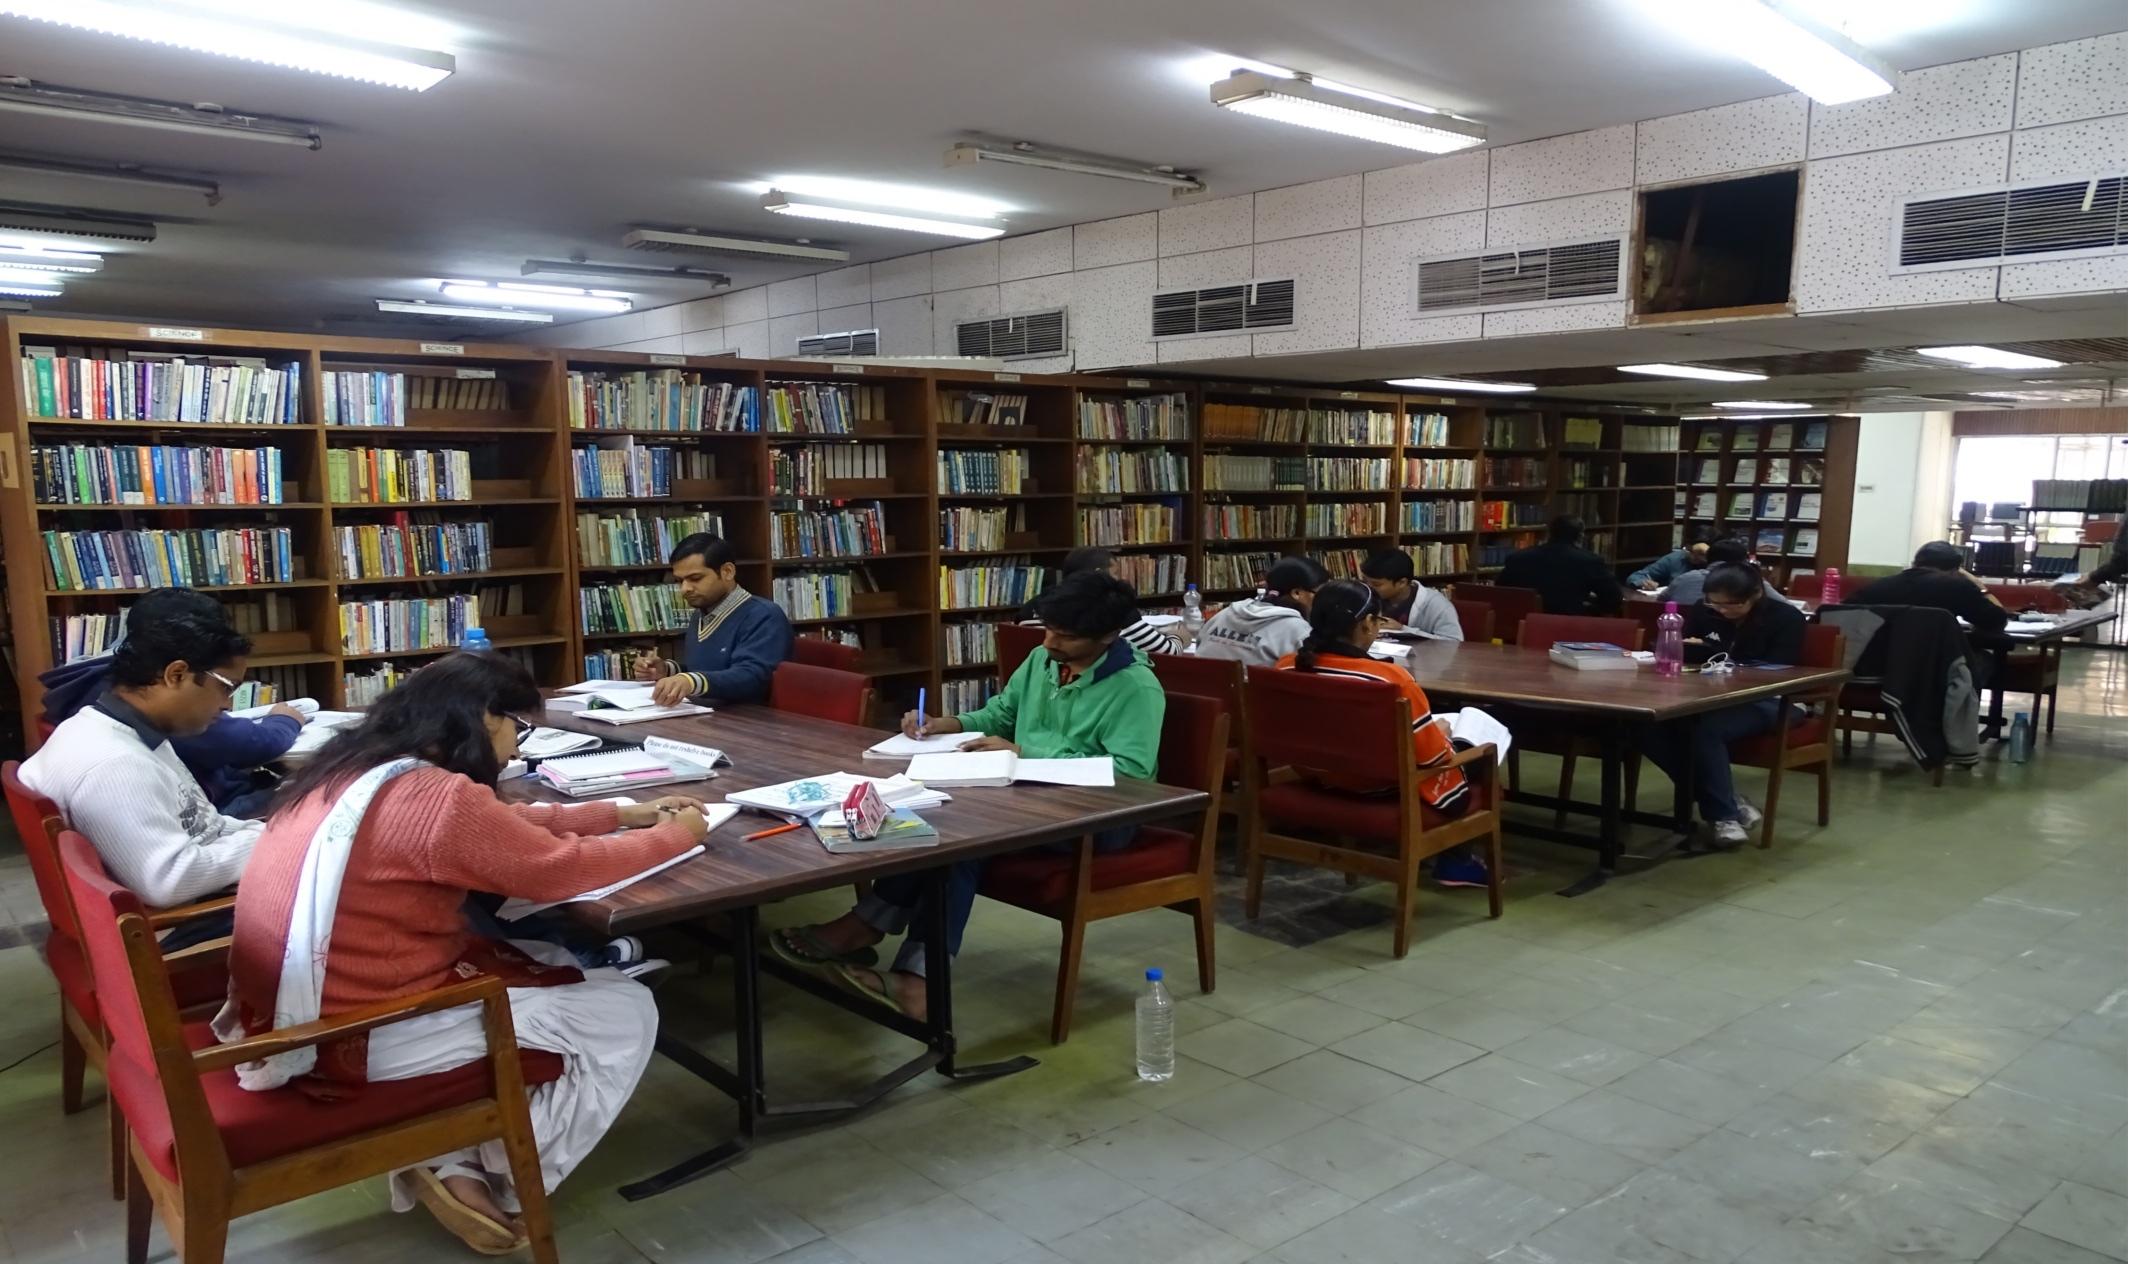 reading gandhi delhi university Mohandas gandhi (1869-1948): references and further reading brown, judith m gandhi: prisoner of hope new delhi: gandhi peace.